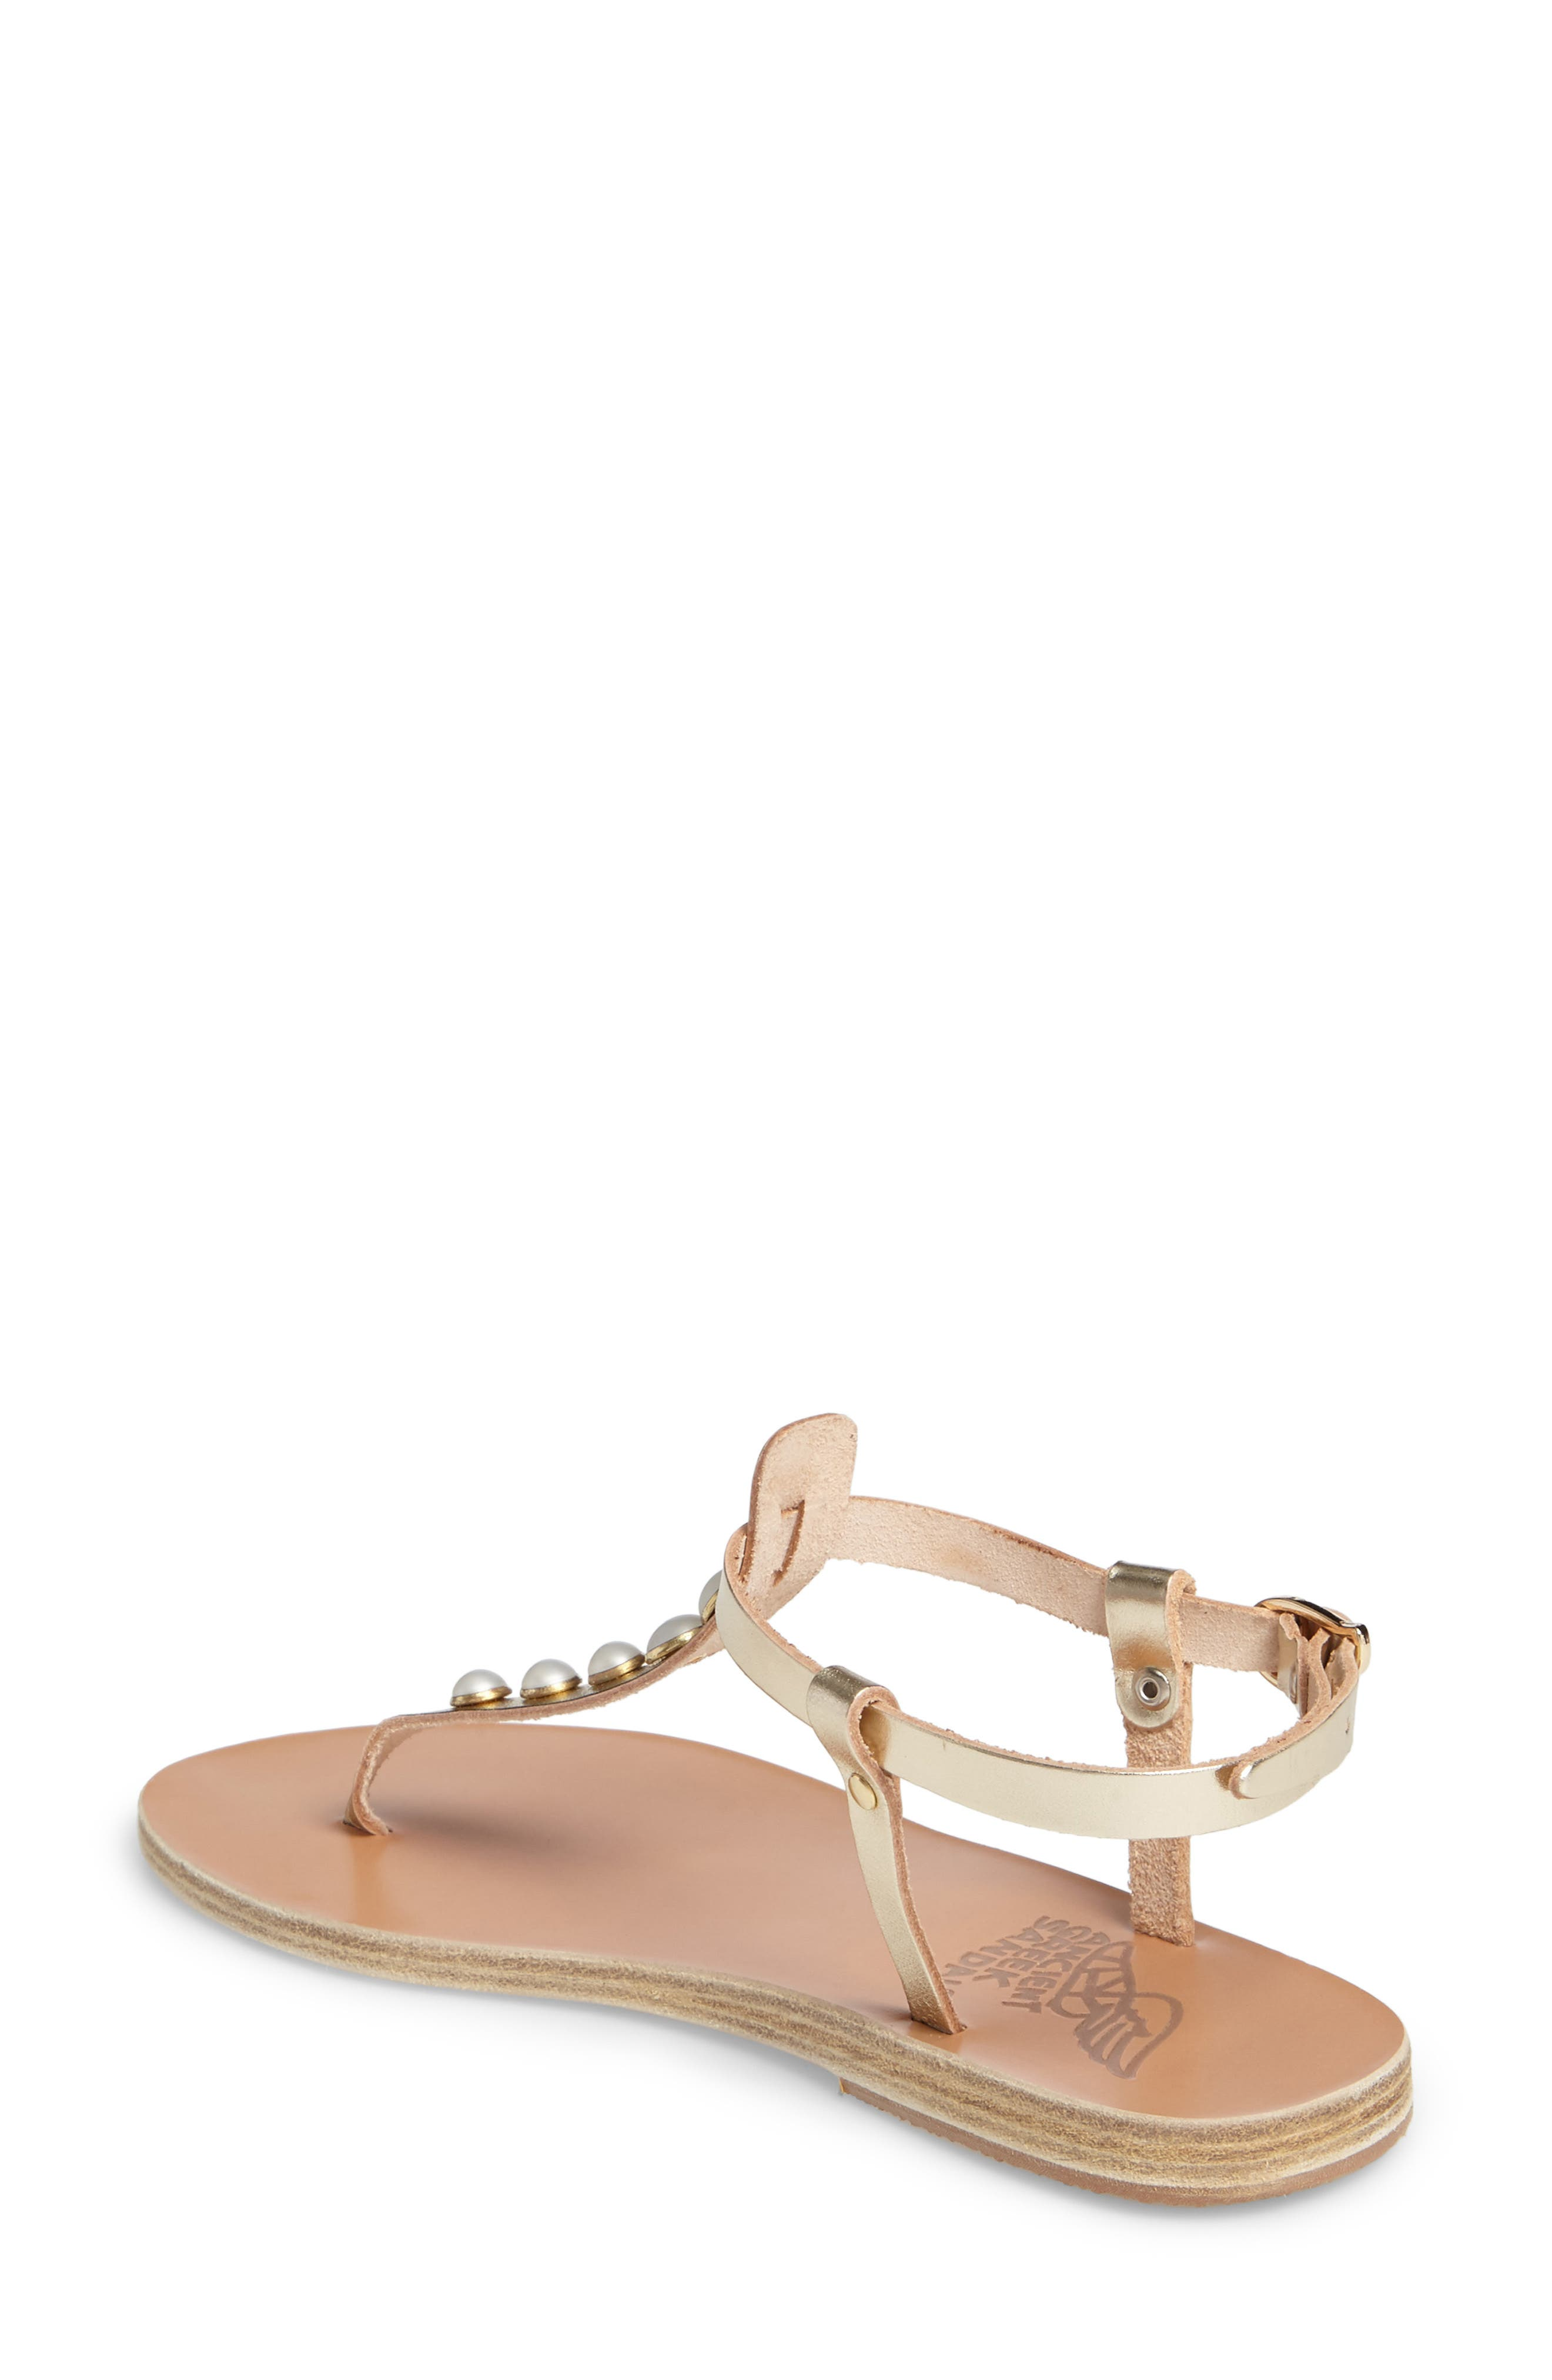 Lito Imitation Pearl Embellished T-Strap Sandal,                             Alternate thumbnail 2, color,                             040